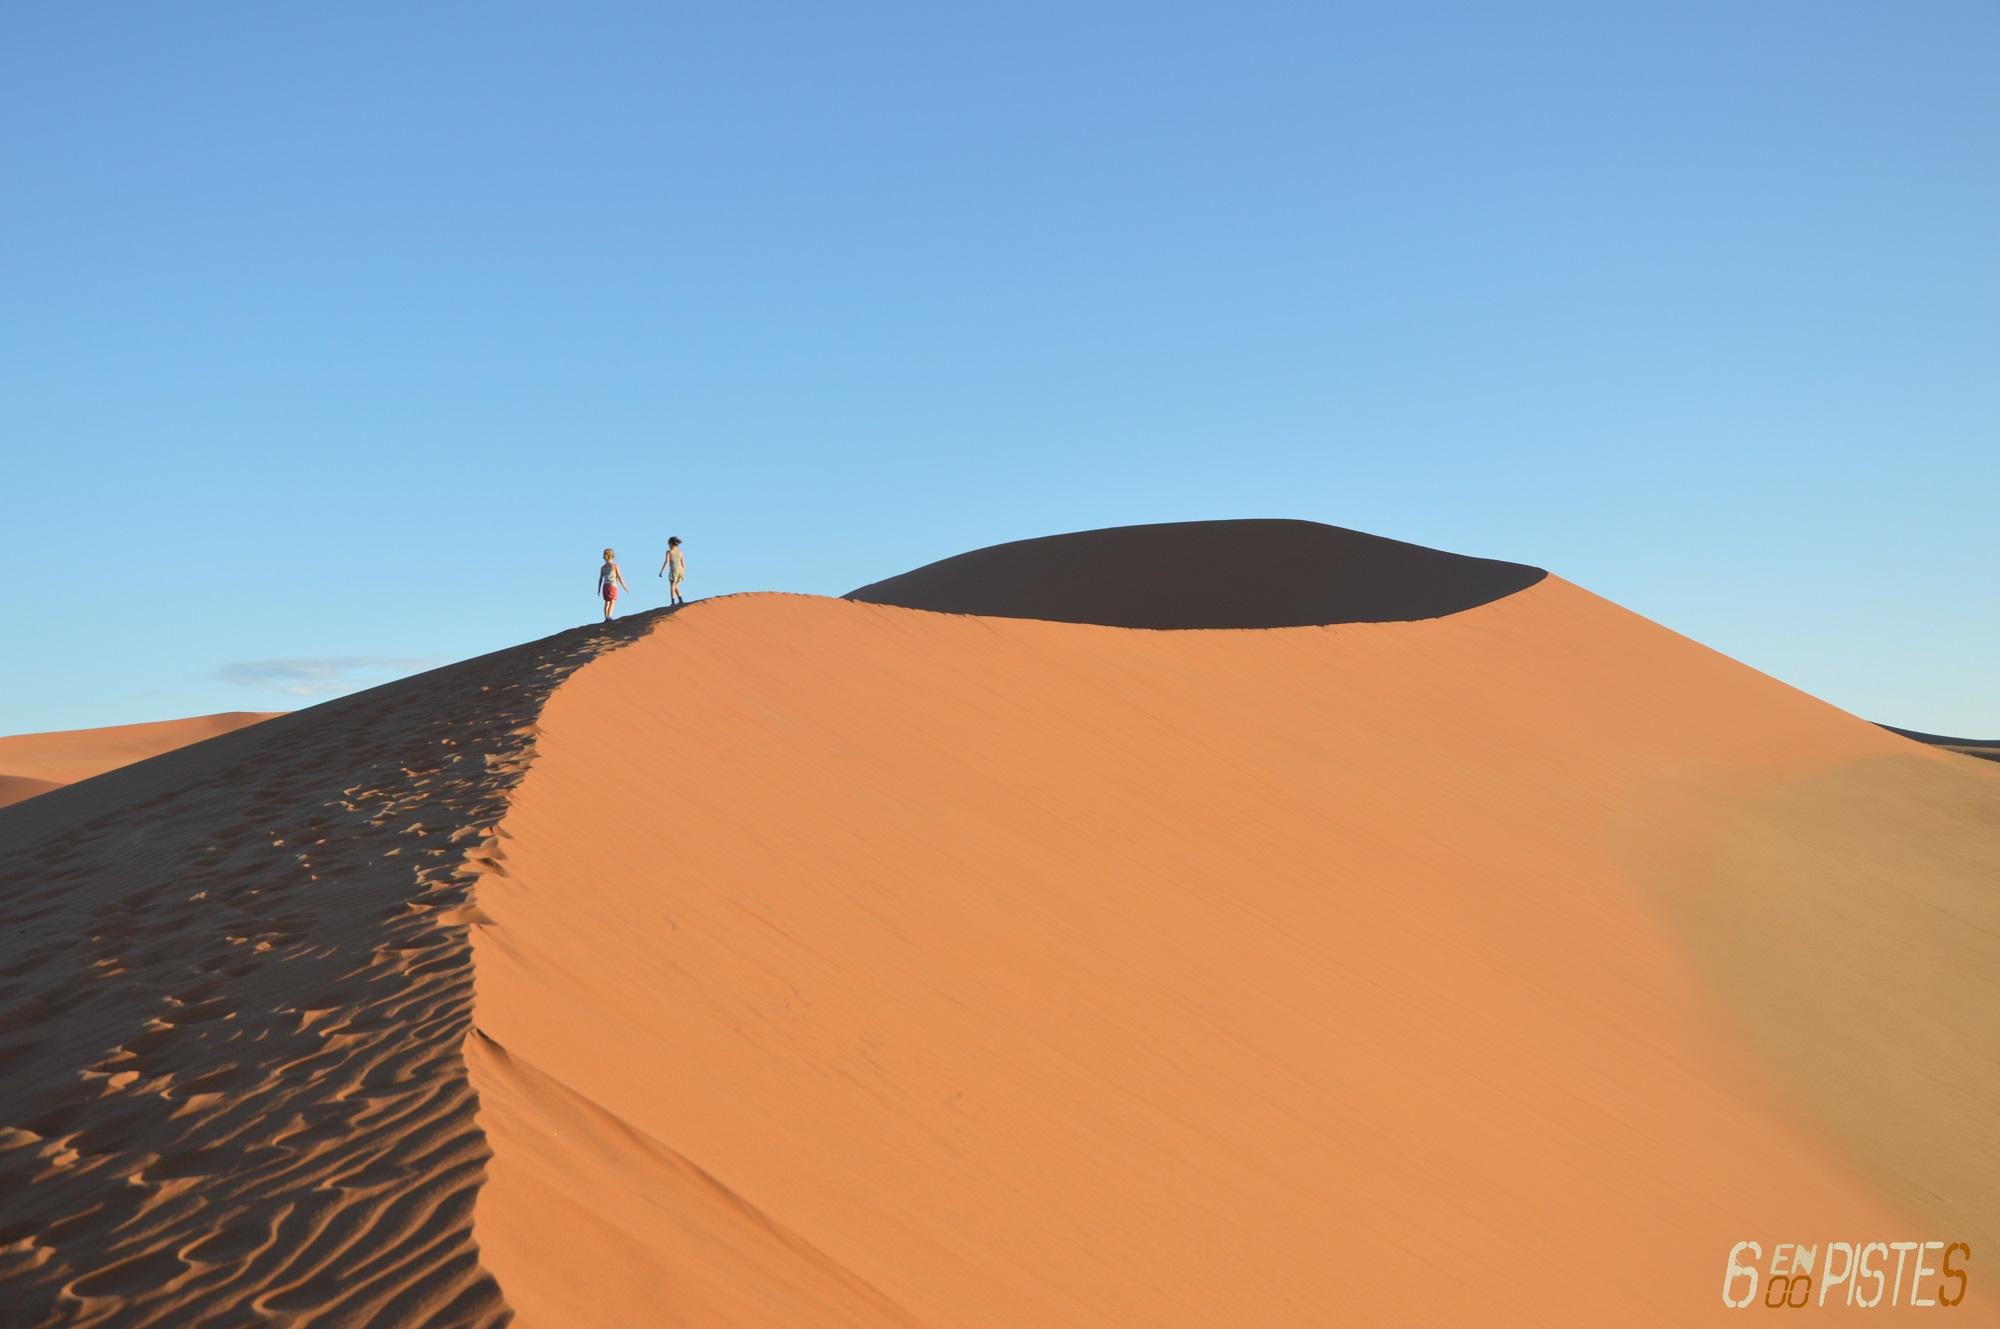 Six en Piste - Namibia red dunes